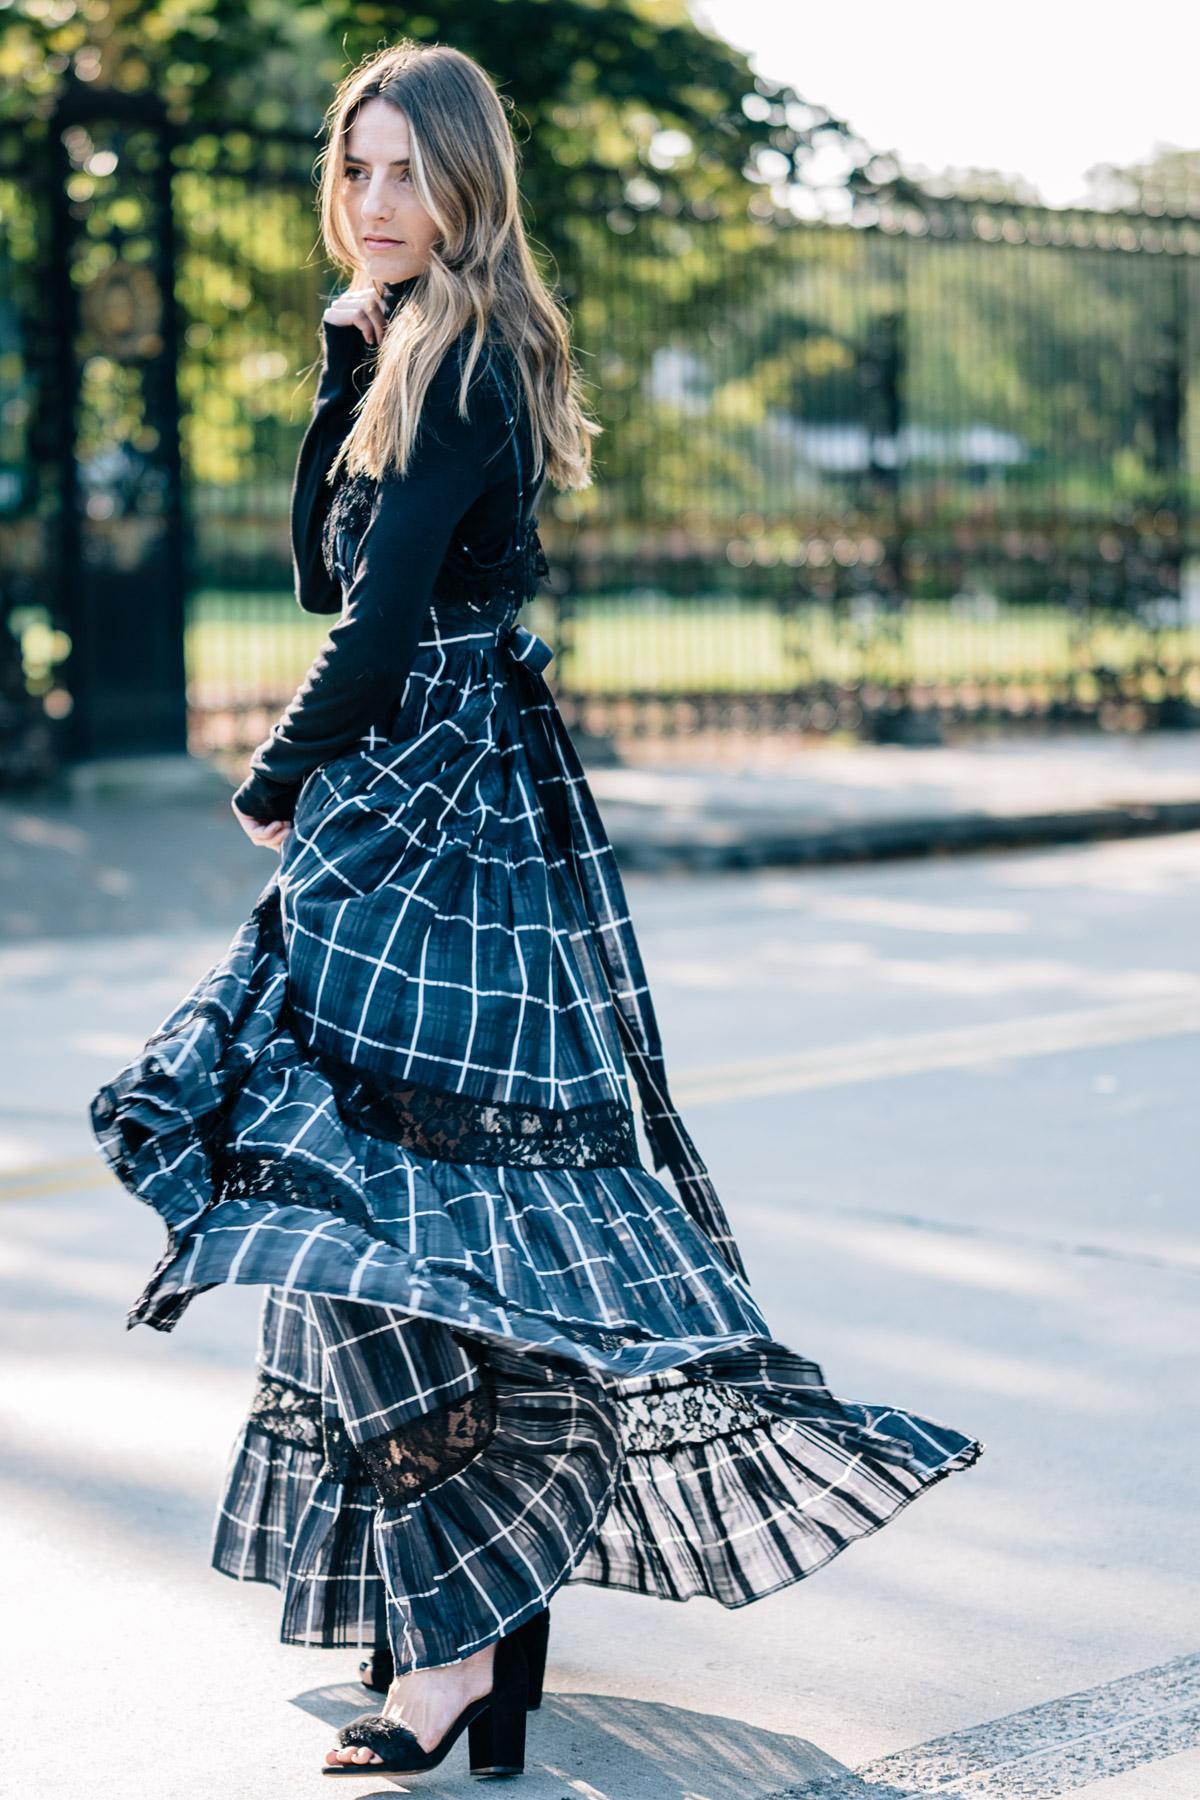 Jess Ann Kirby wears the Vetiver communication breakdown plaid maxi dress for a fall wedding